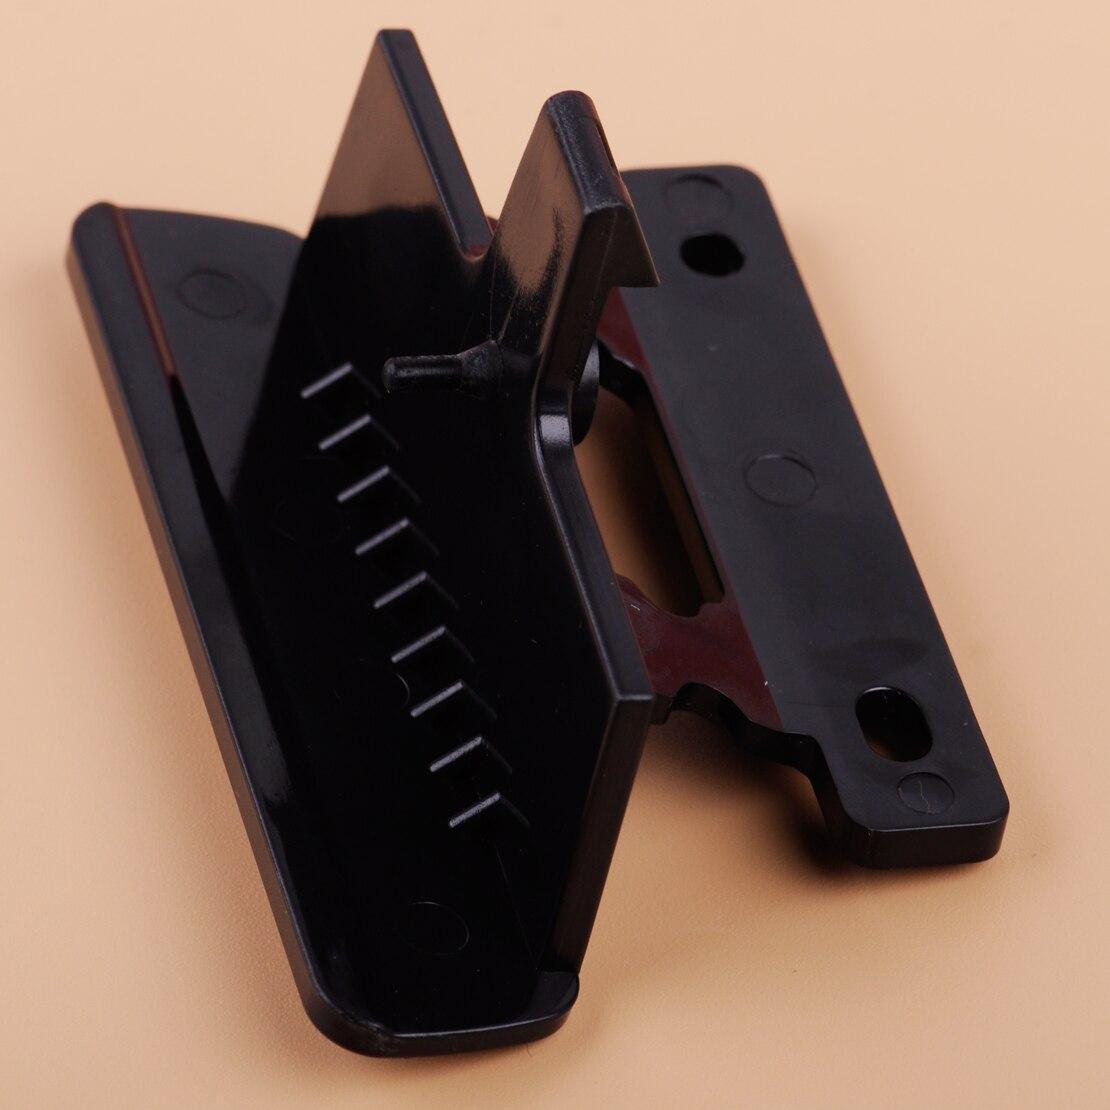 Center Console Armrest Latch Lid Lock for Chevy GMC Silverado Sierra Tahoe Yukon